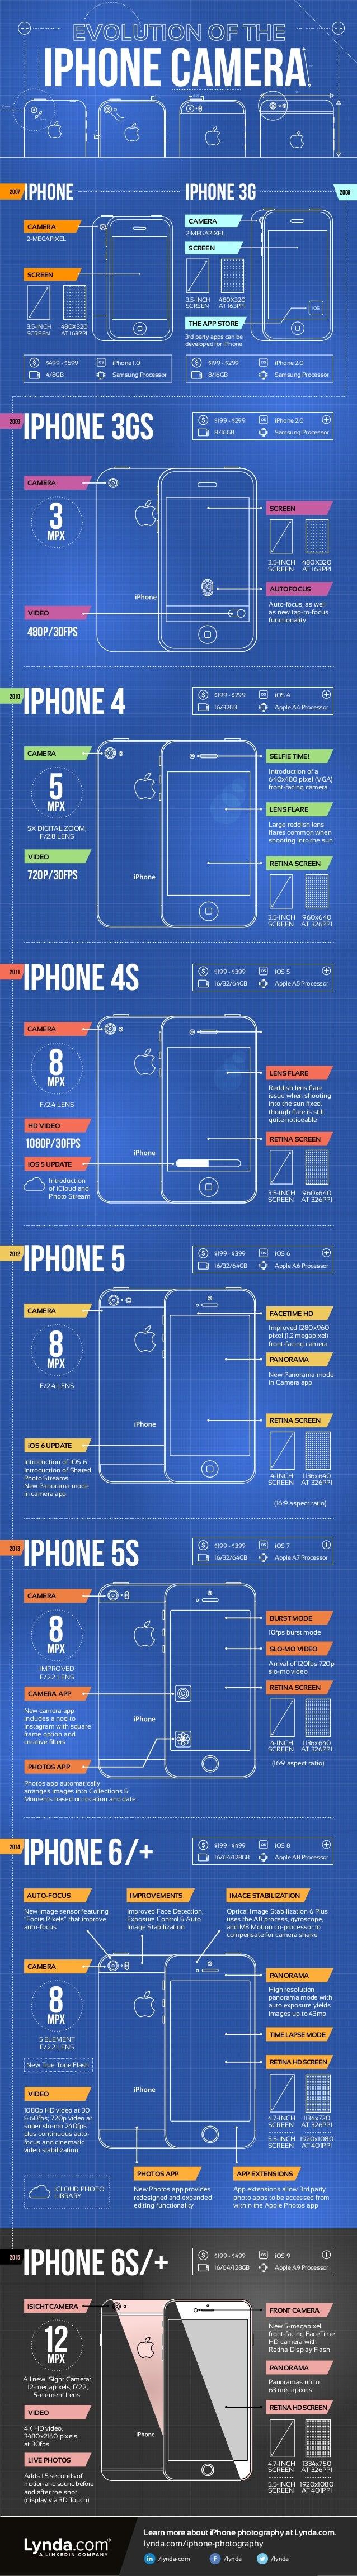 $199 - $299 8/16GB iPhone 2.0 Samsung Processor $199 - $299 8/16GB iPhone 2.0 Samsung Processor $499 - $599 4/8GB iPhone 1...